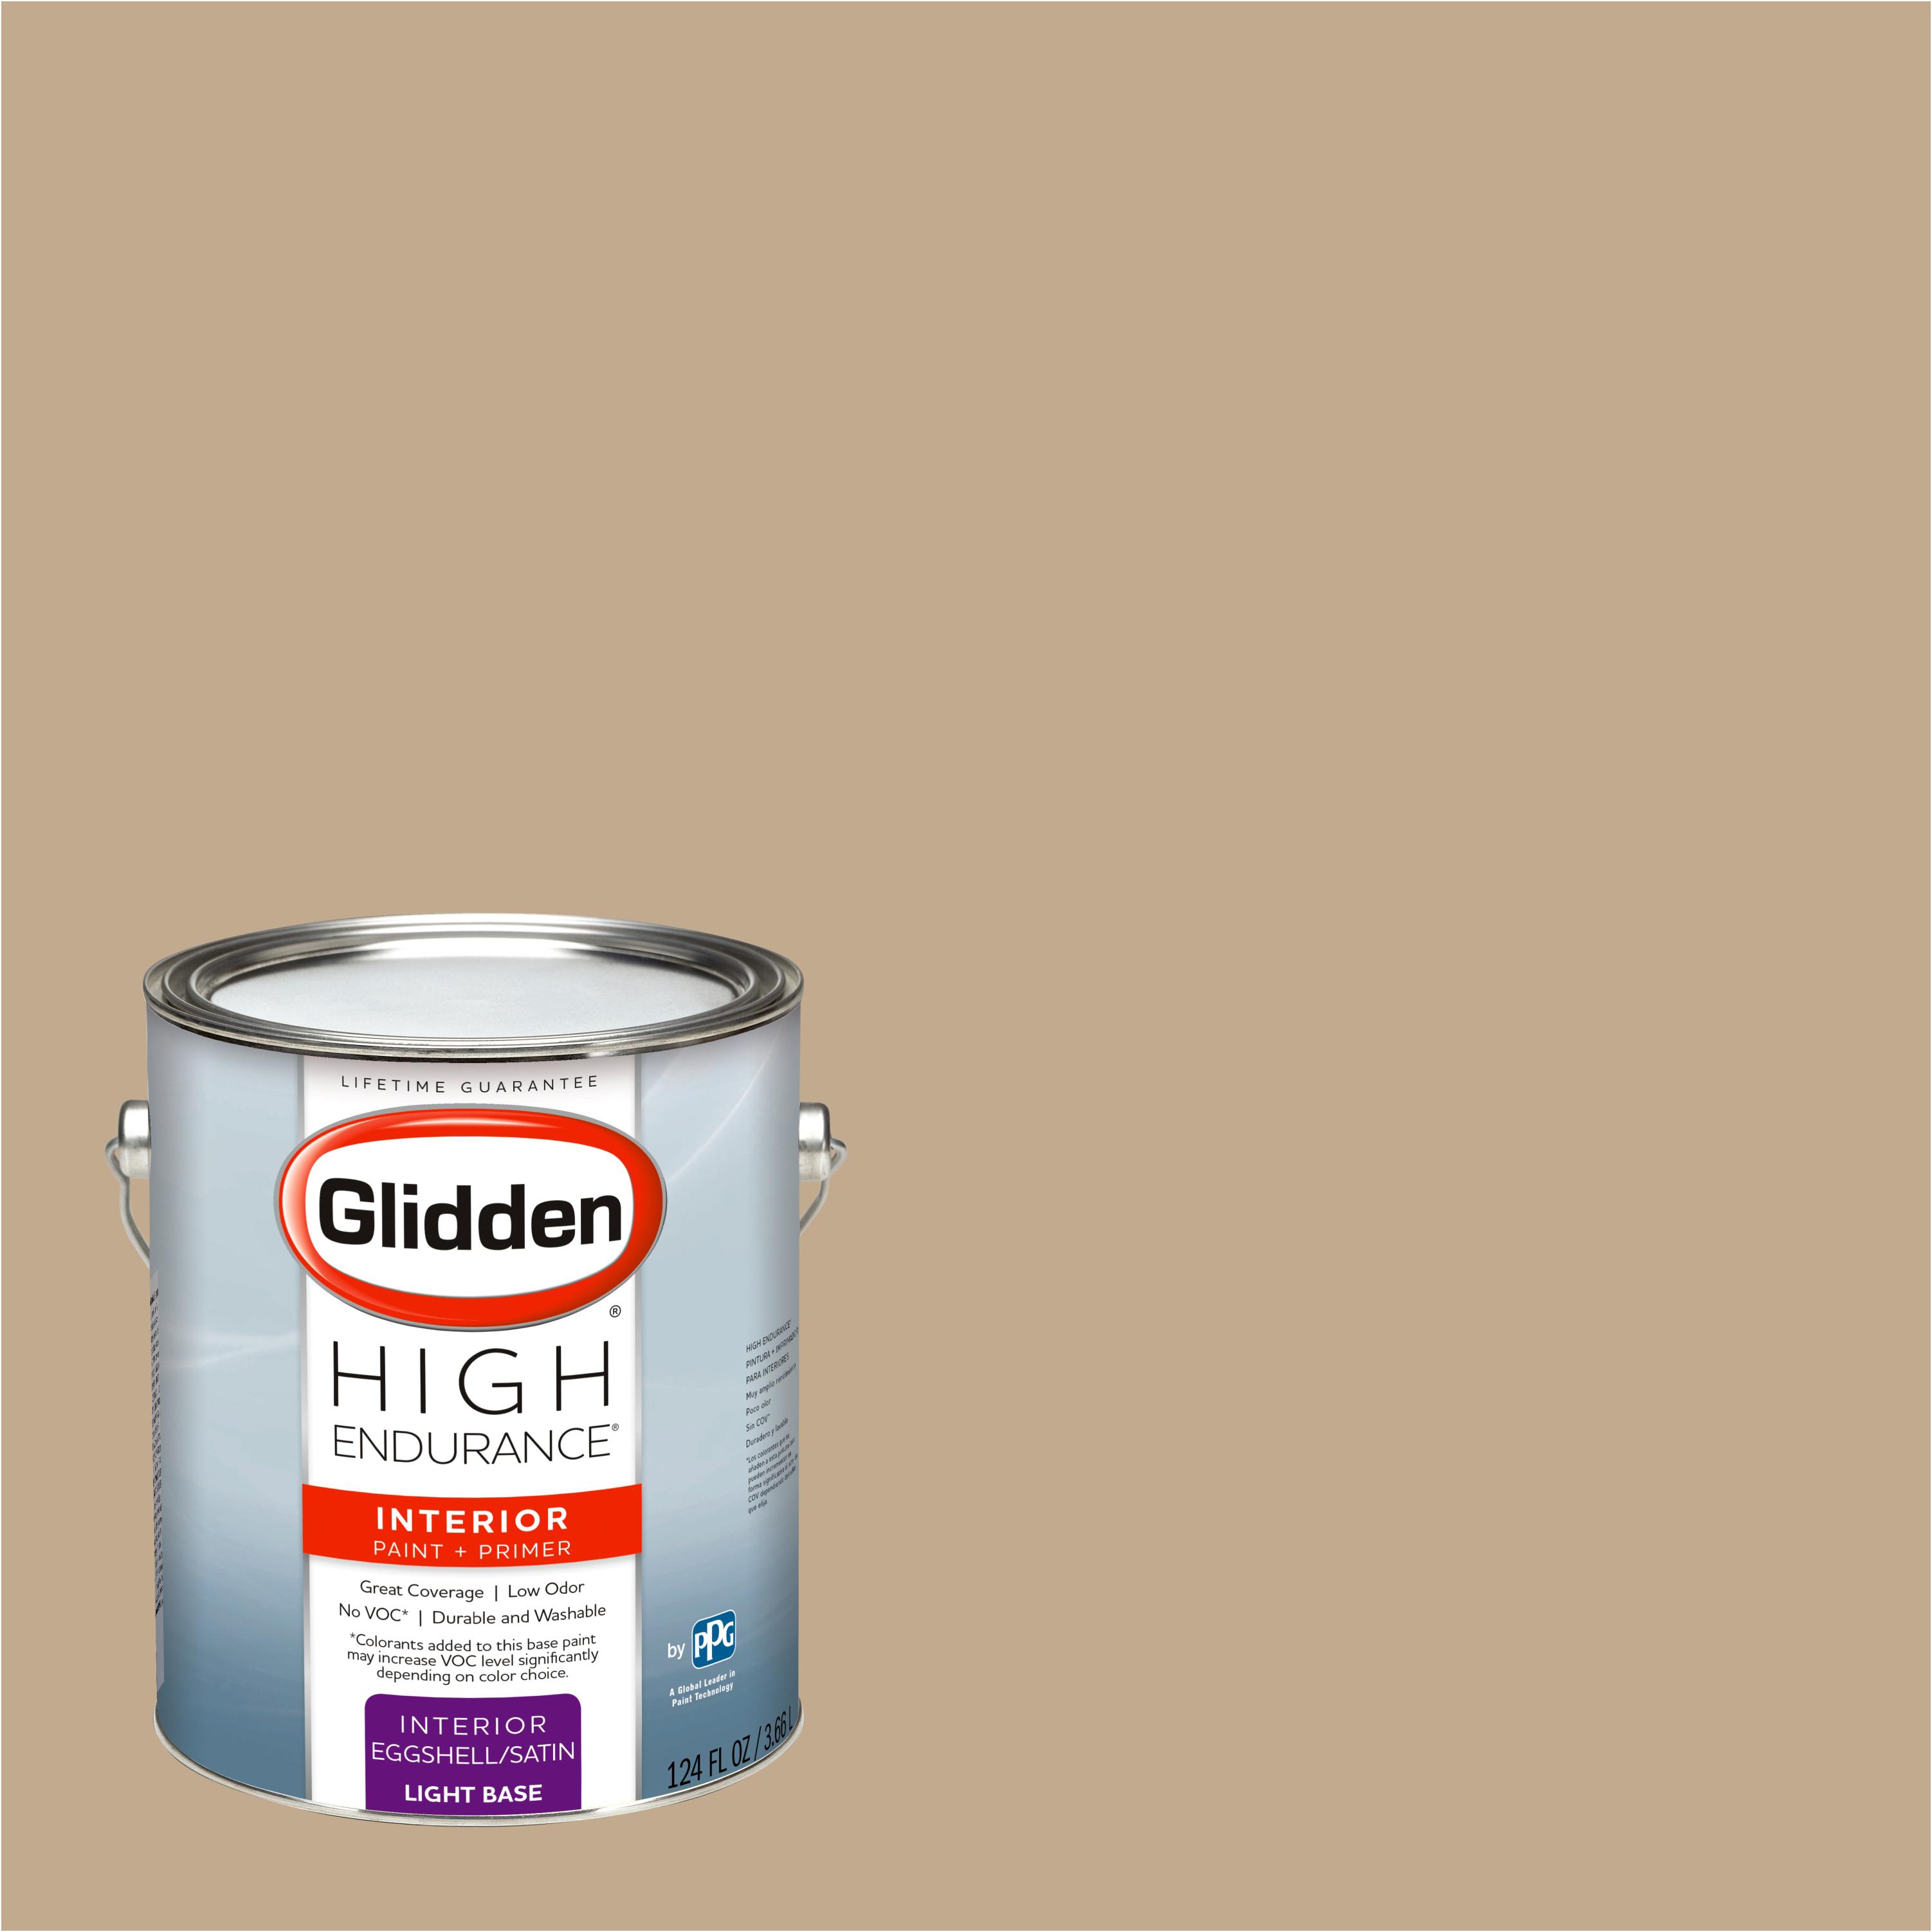 Glidden High Endurance, Interior Paint and Primer, Highland Plains Neutral, # 10YY 41/175